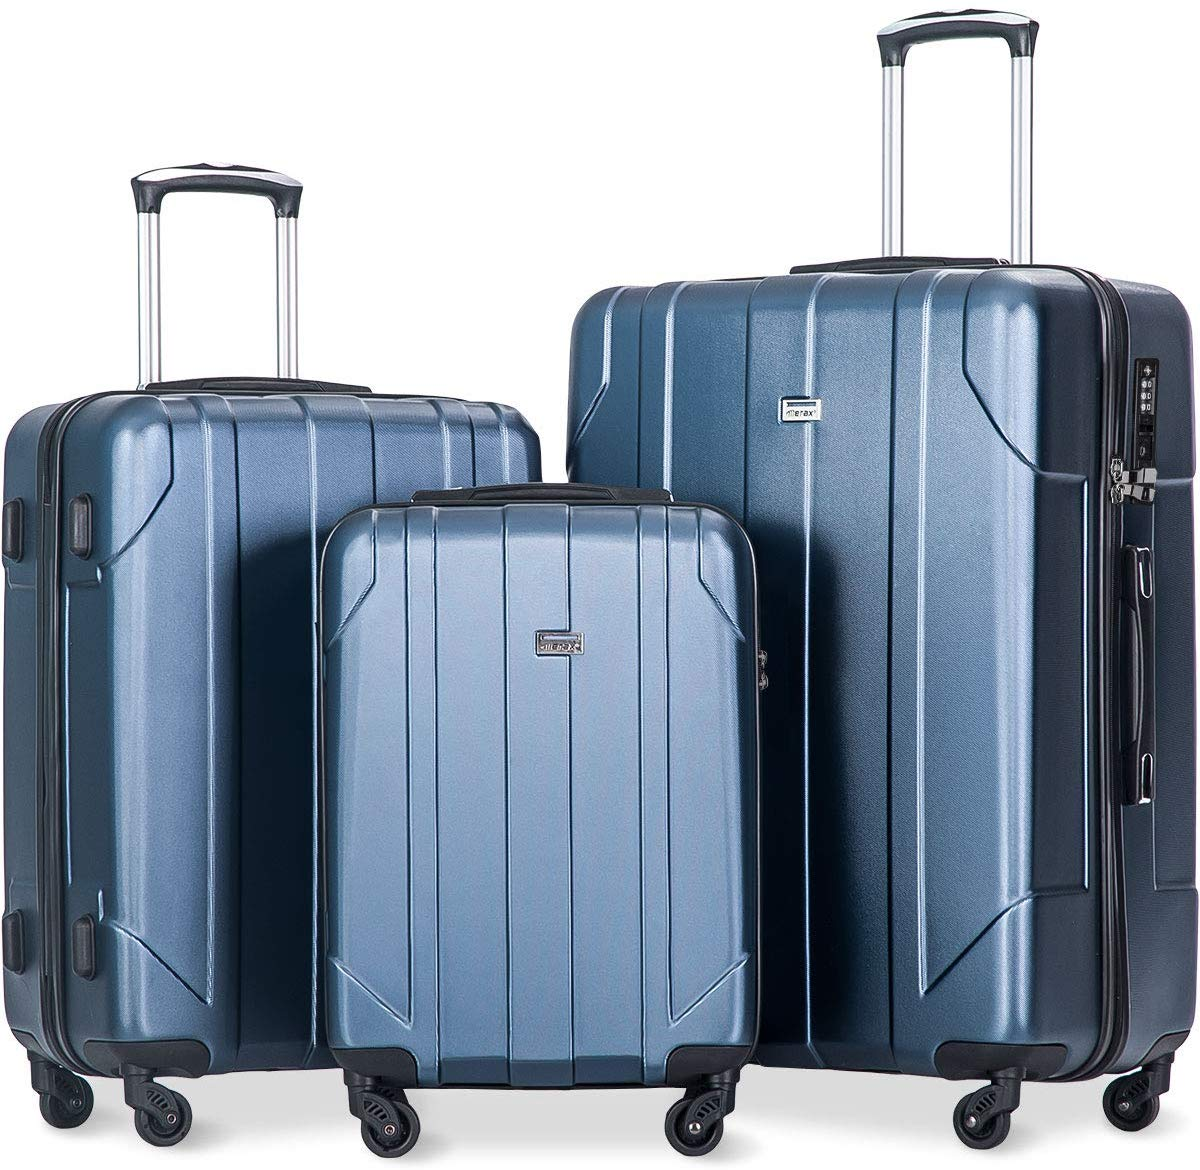 Merax P.E.T Luggage set